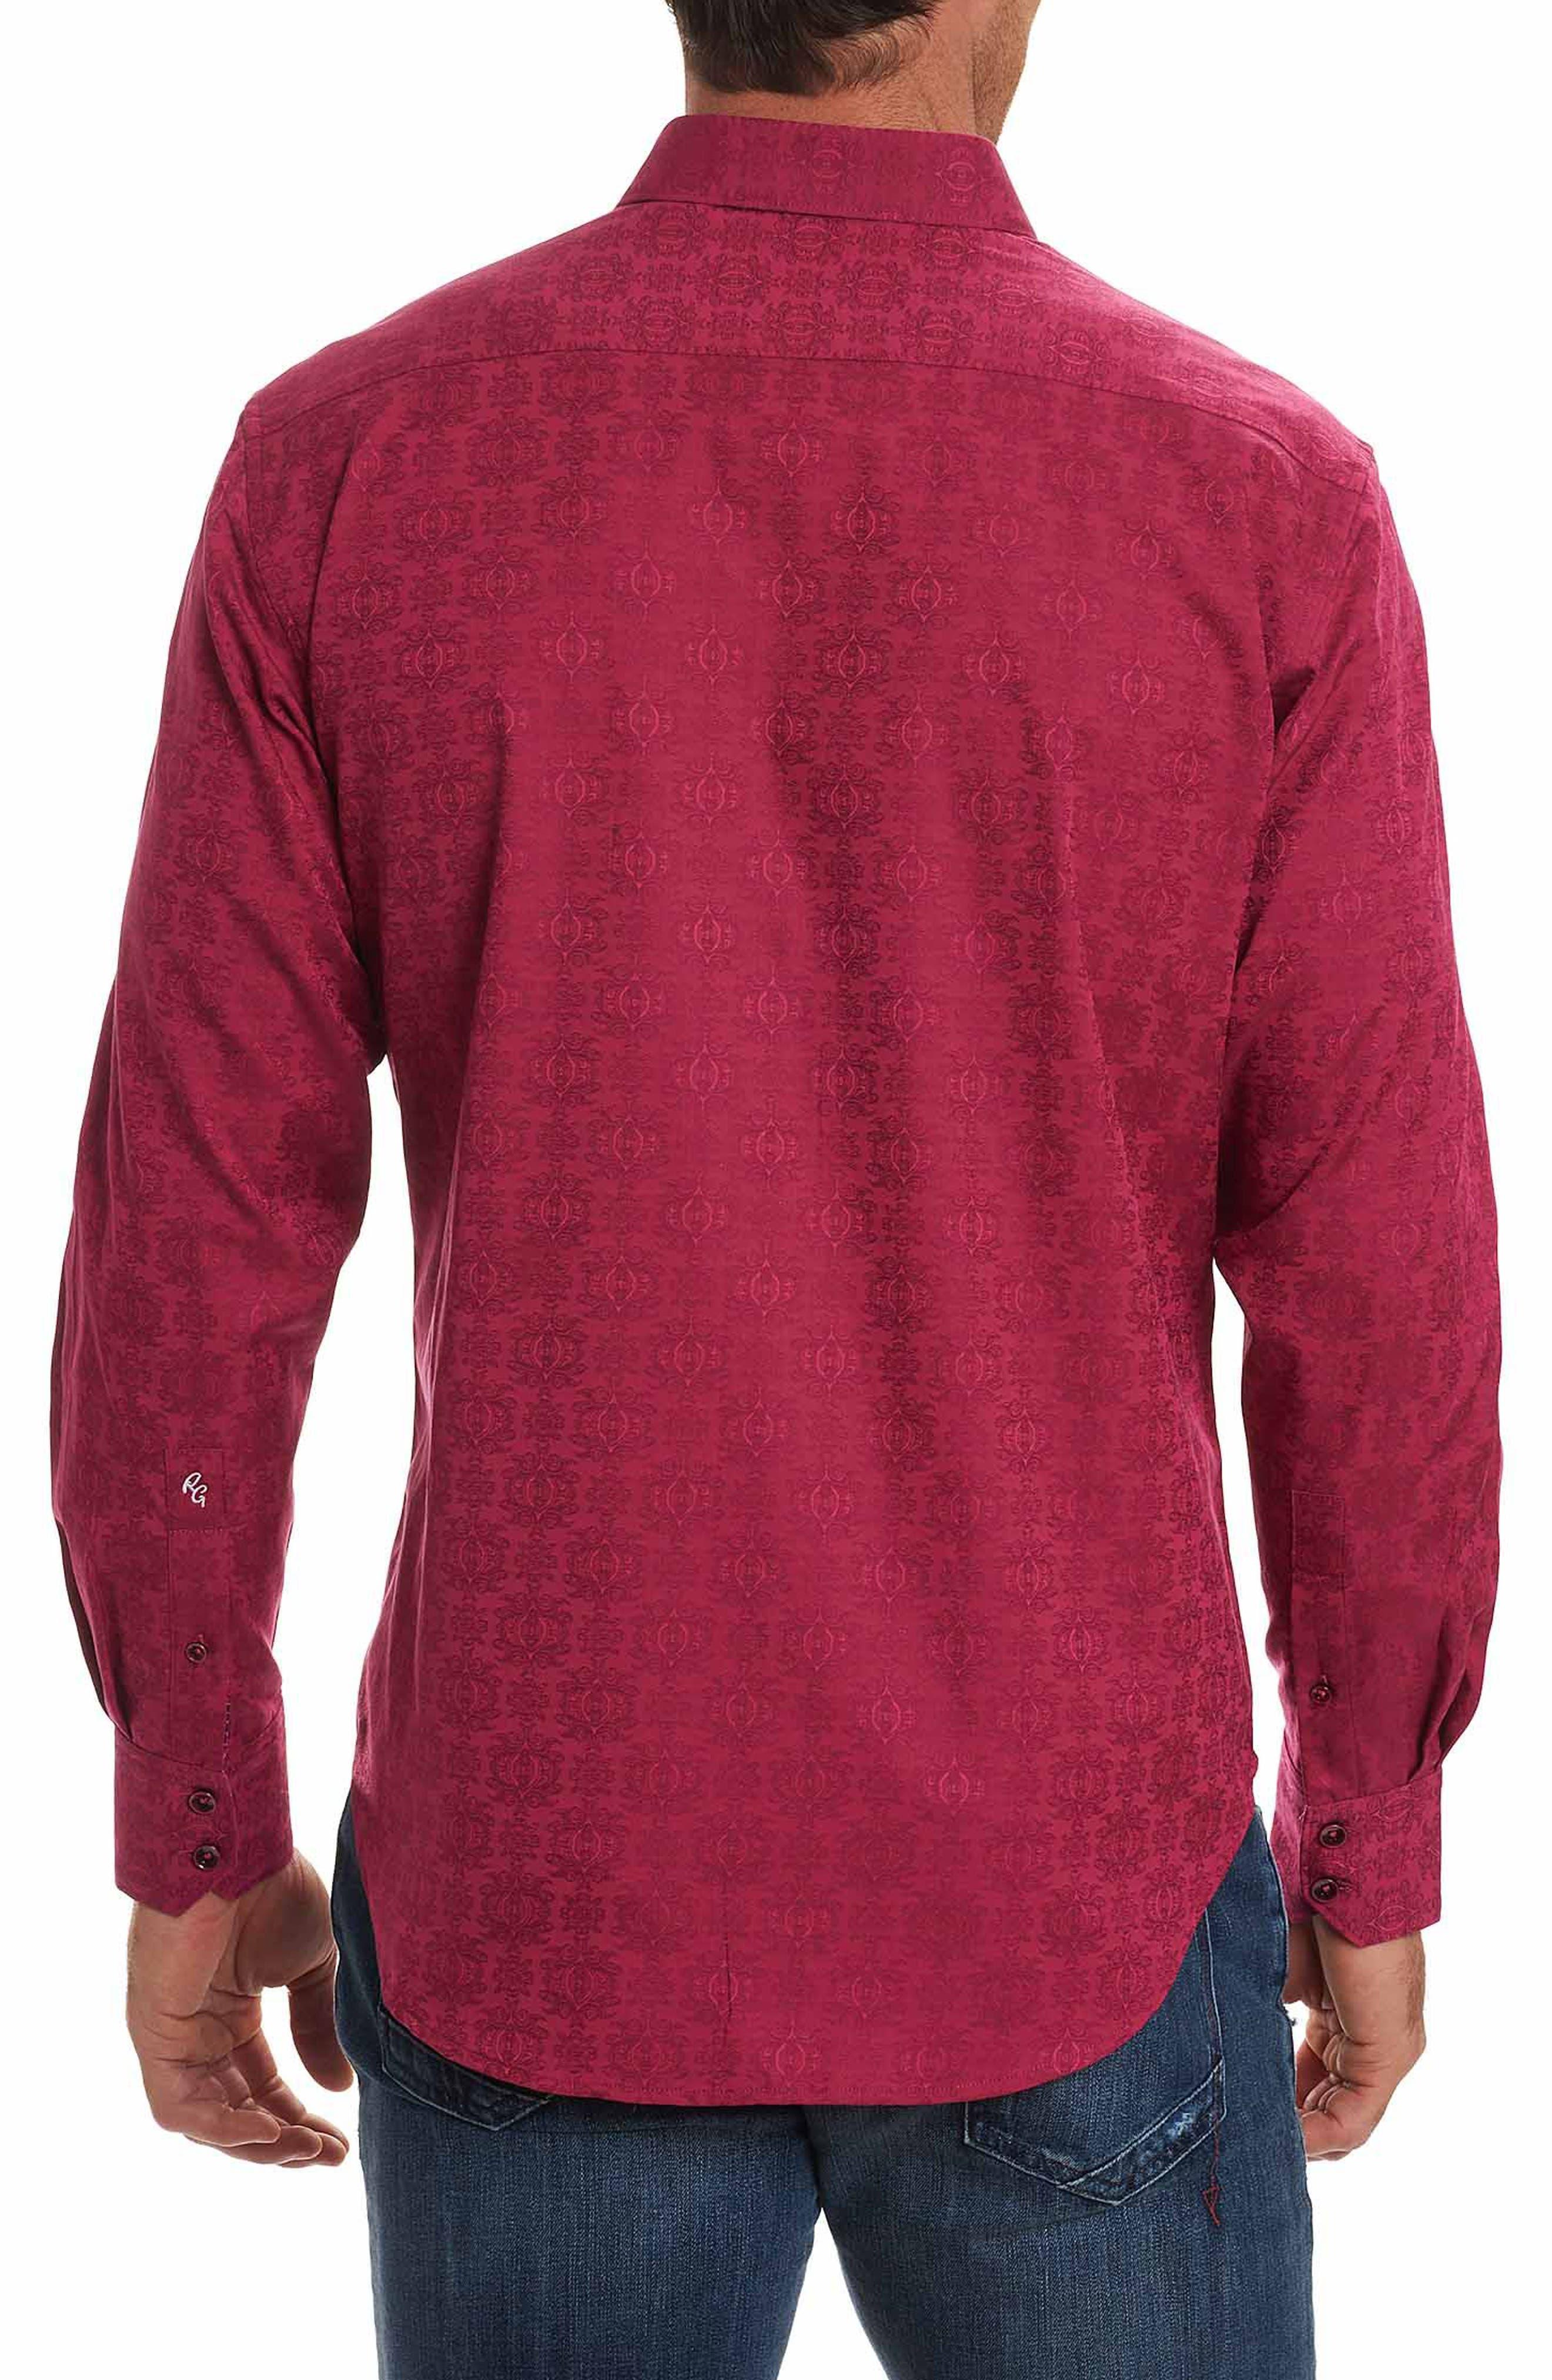 Cullen Classic Fit Jacquard Sport Shirt,                             Alternate thumbnail 3, color,                             Rose